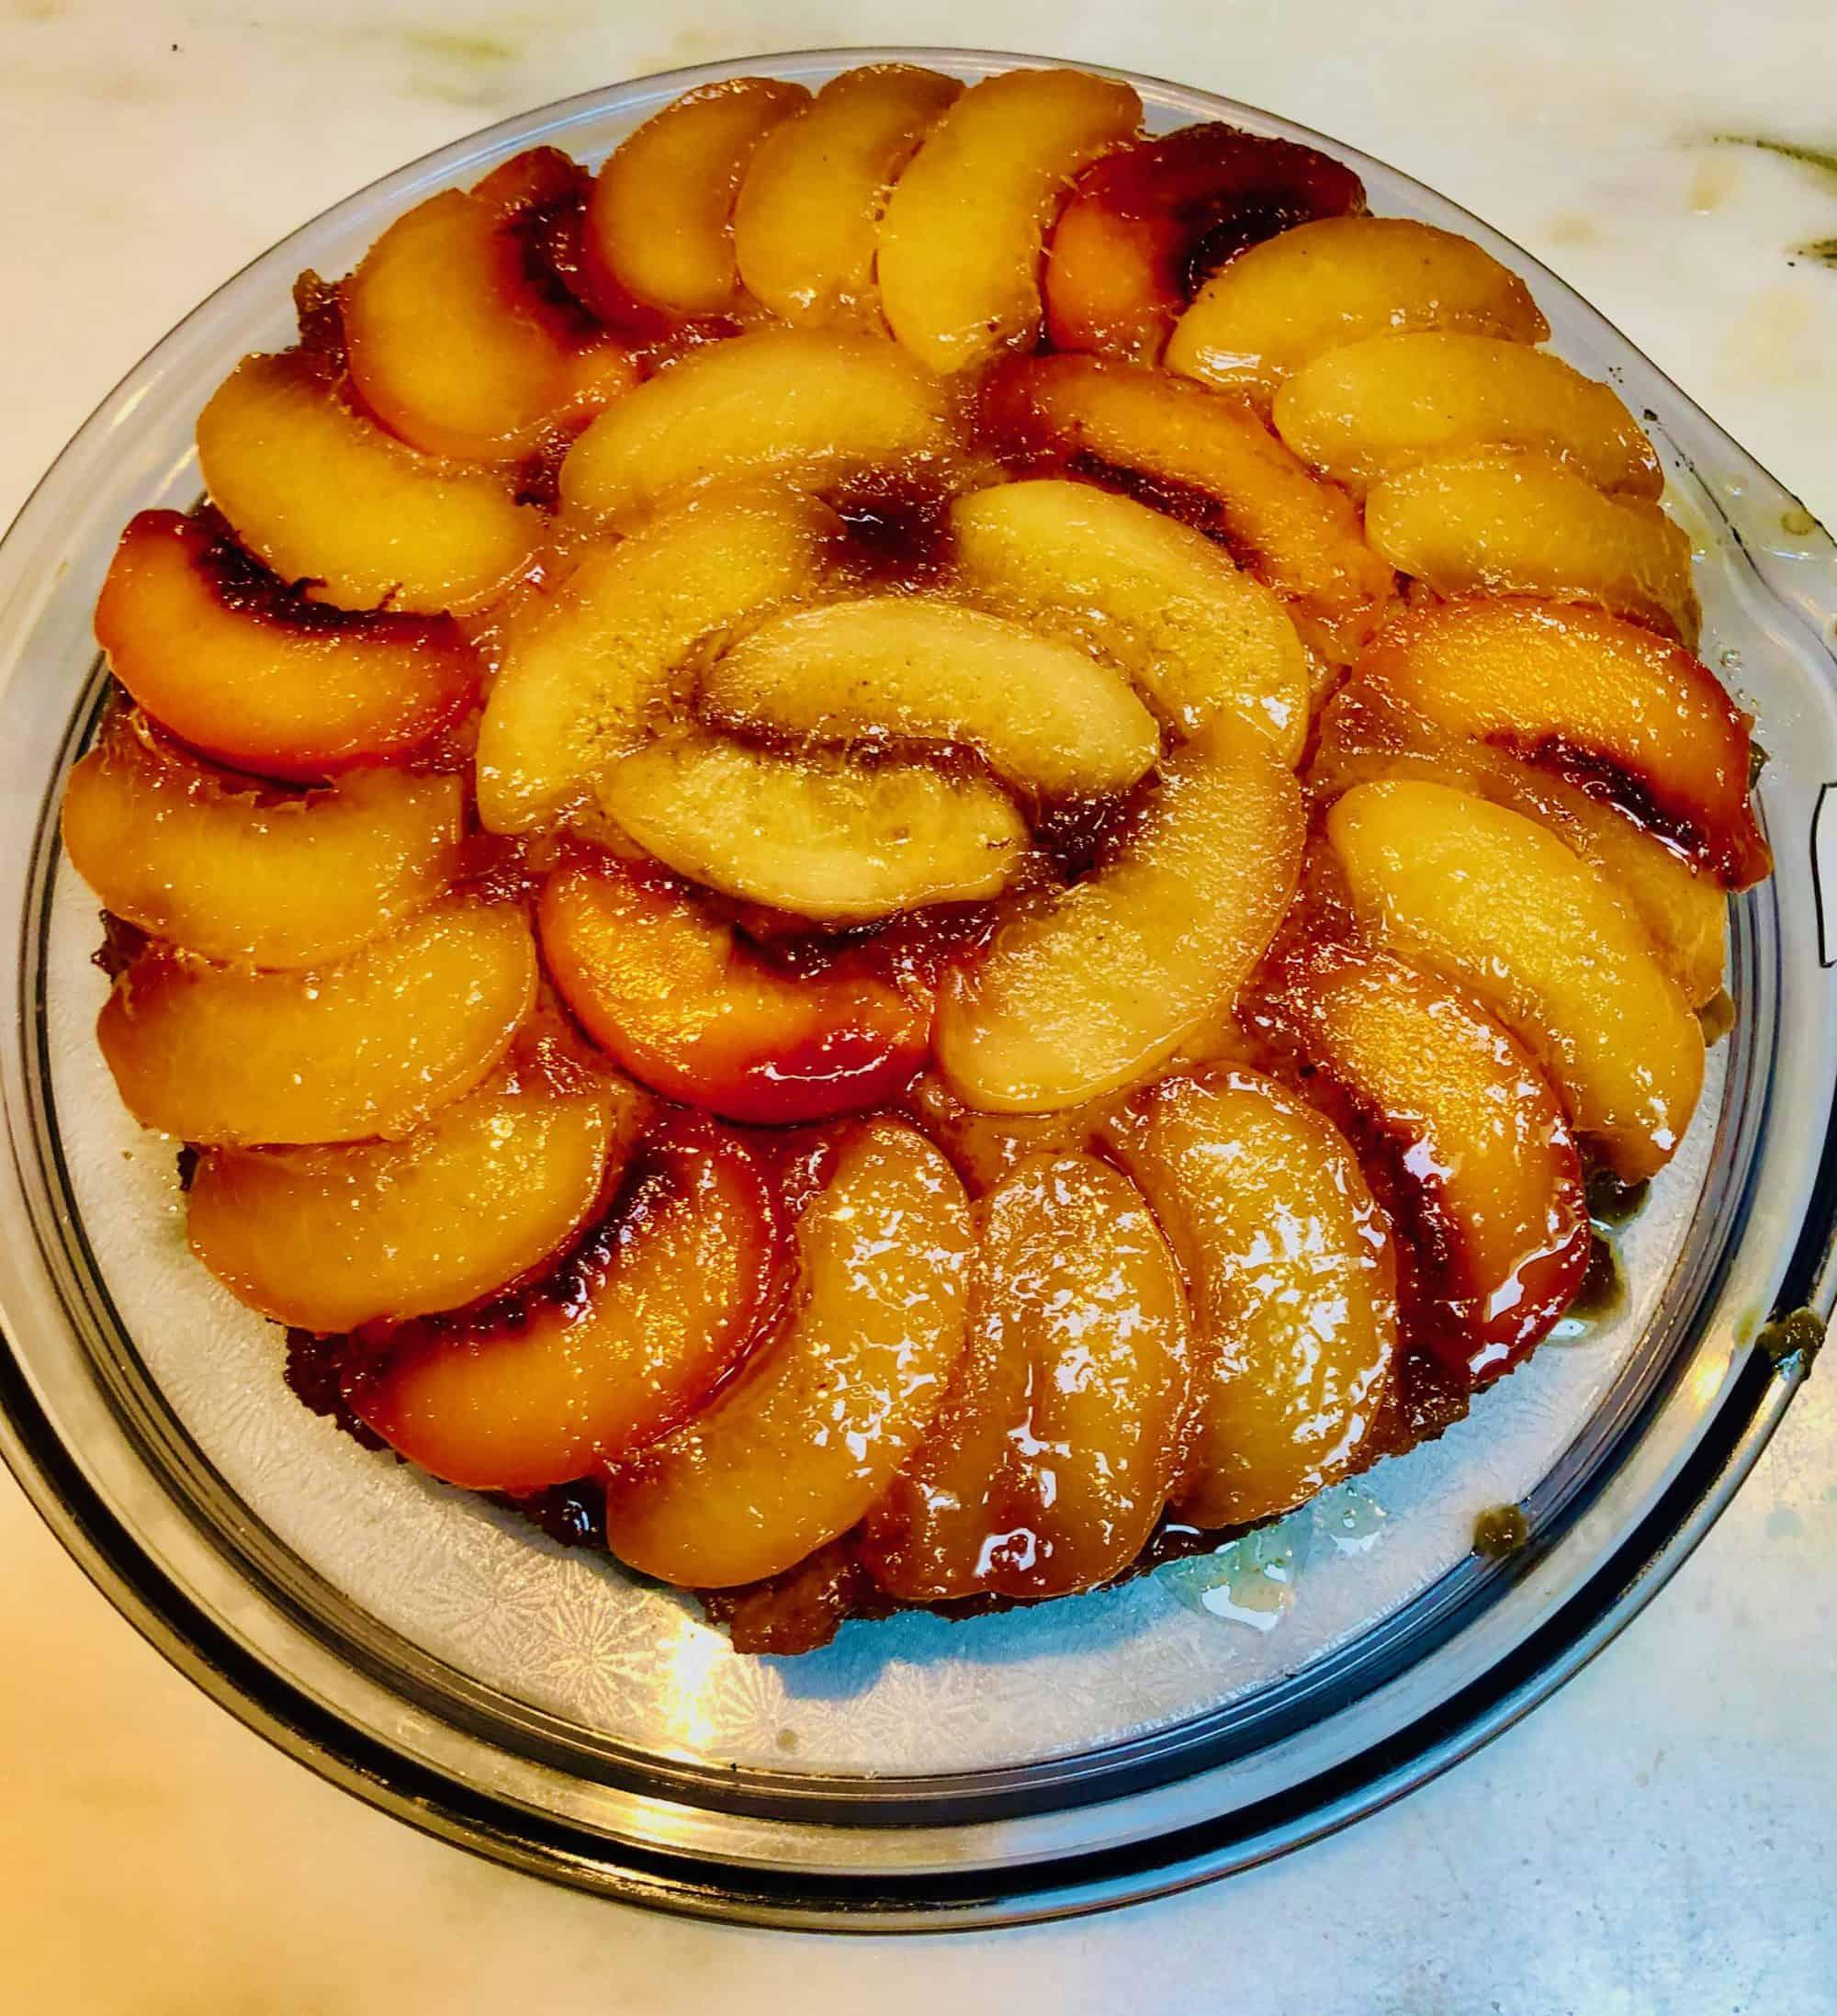 Tyler Florence's Peach-Almond Upside-Down Cake